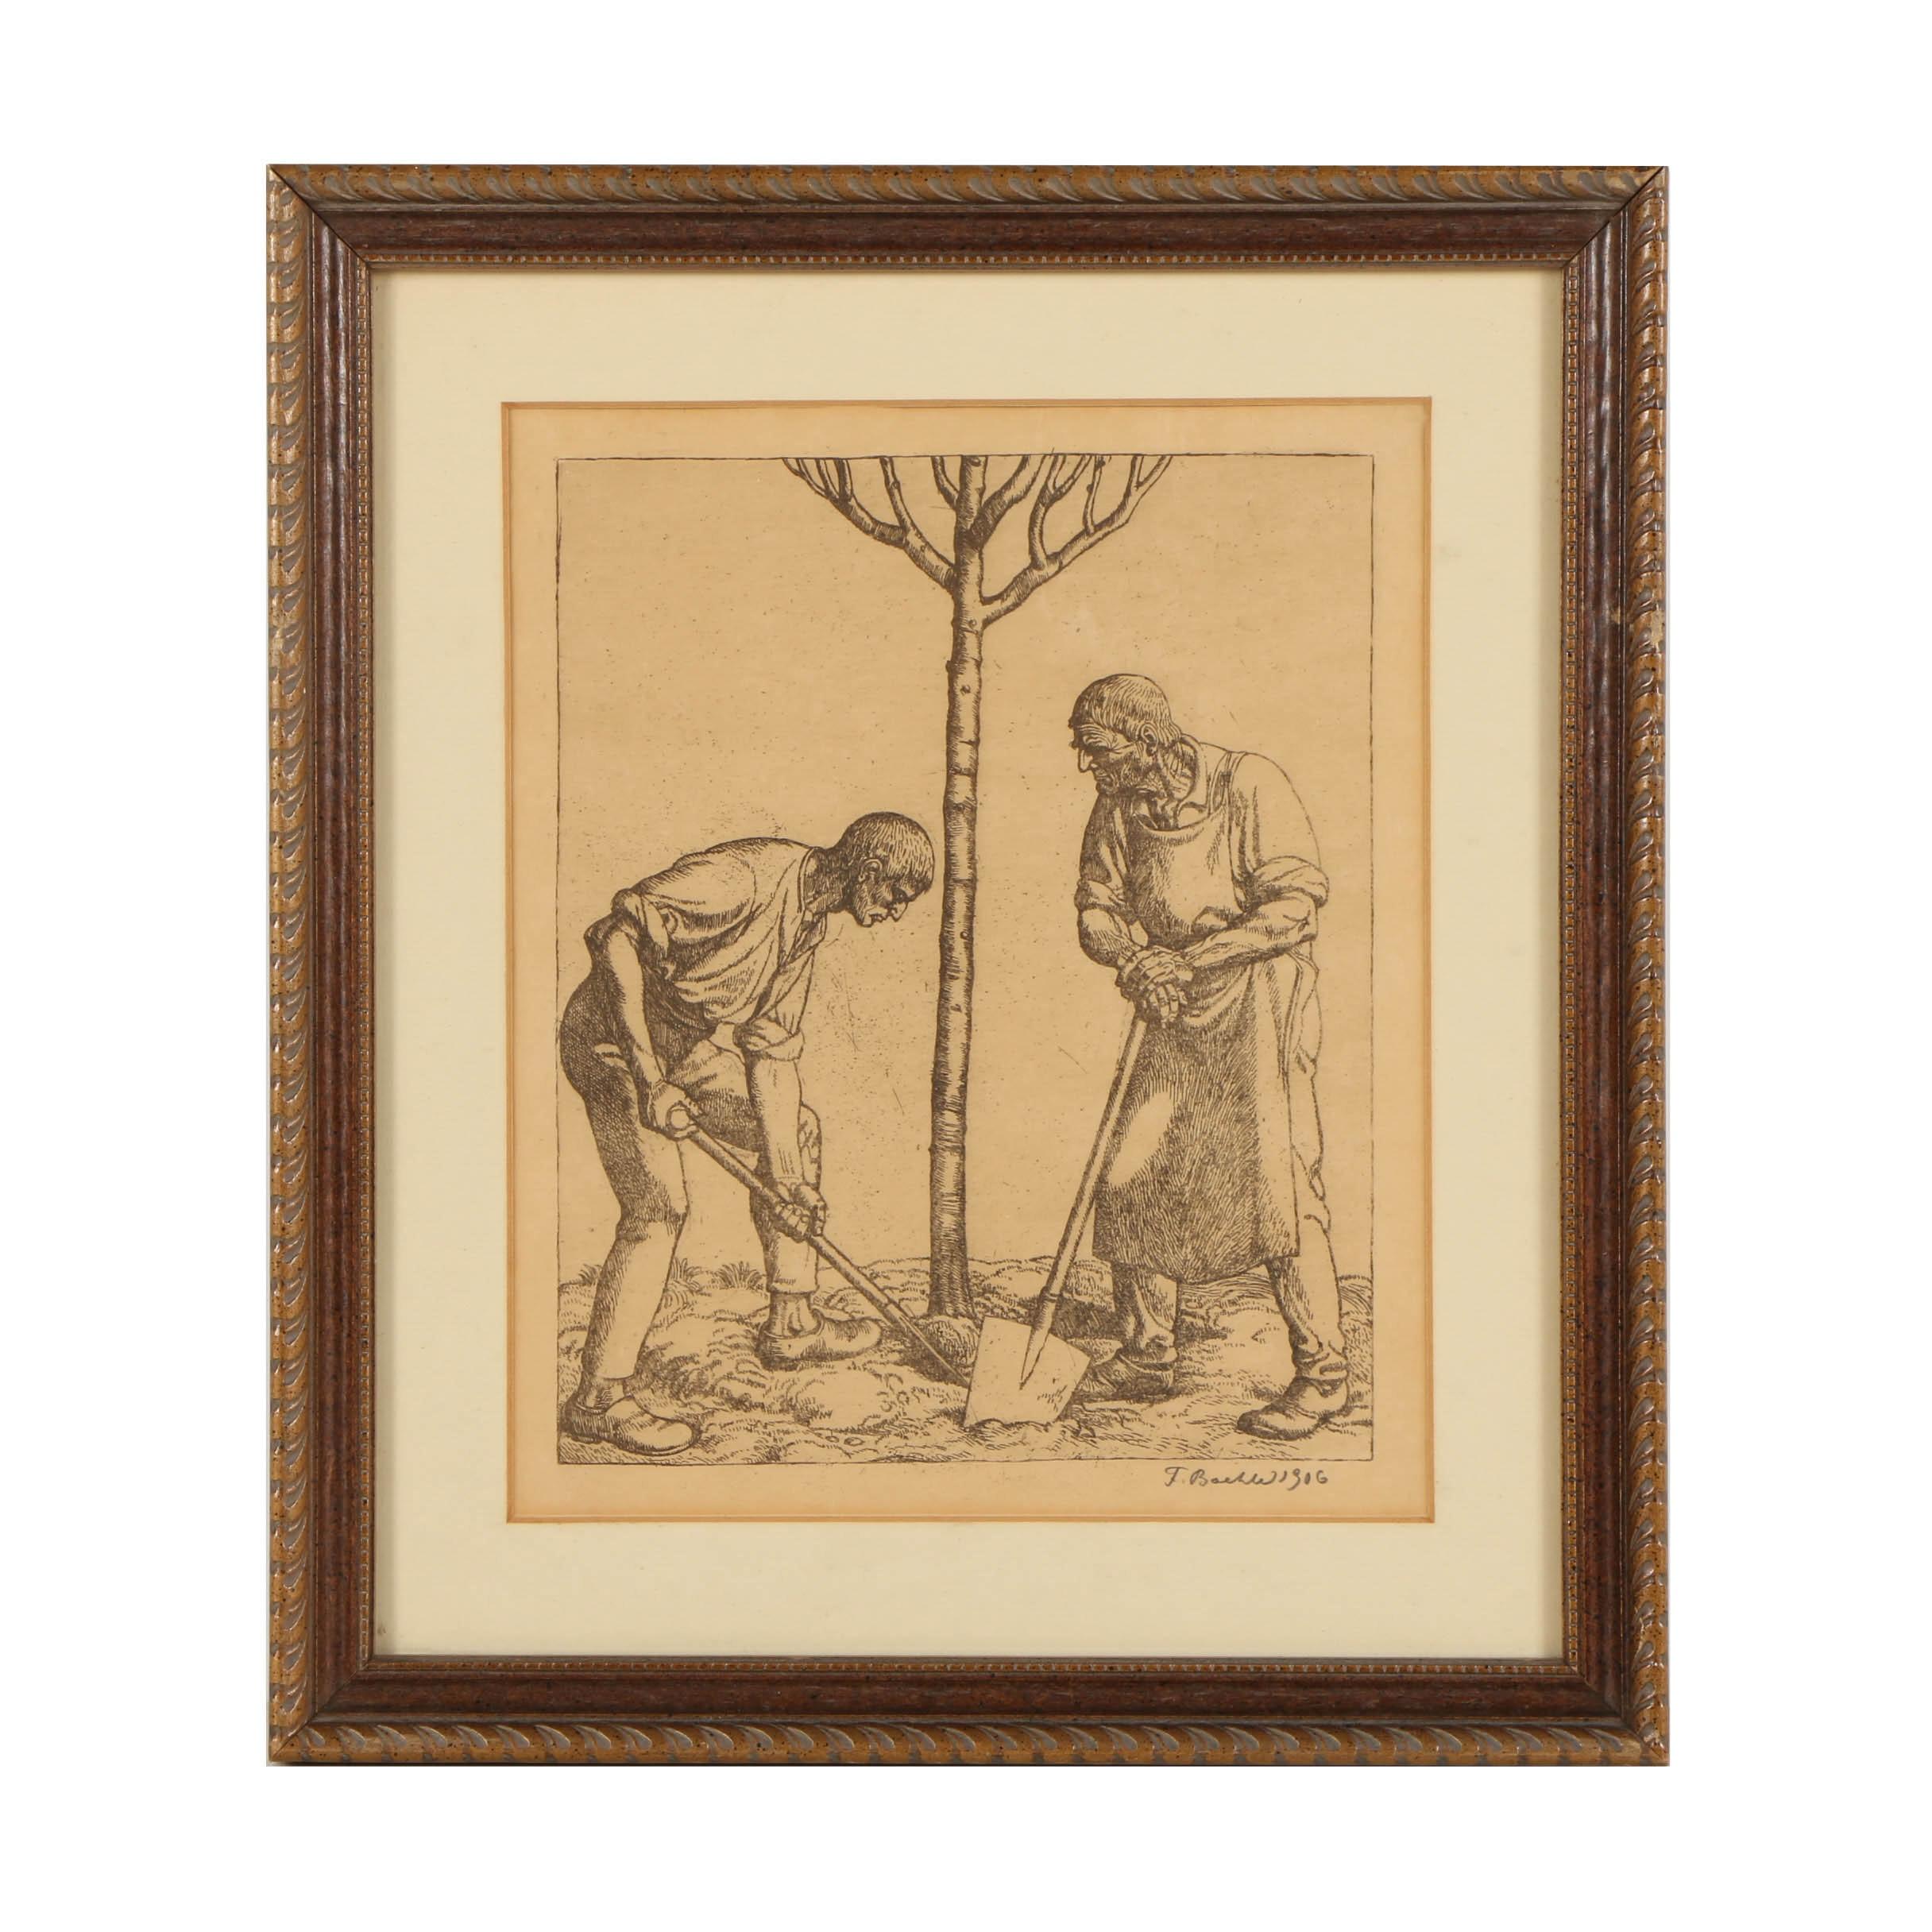 Fritz Boehle Wood Engraving on Paper of Men Digging